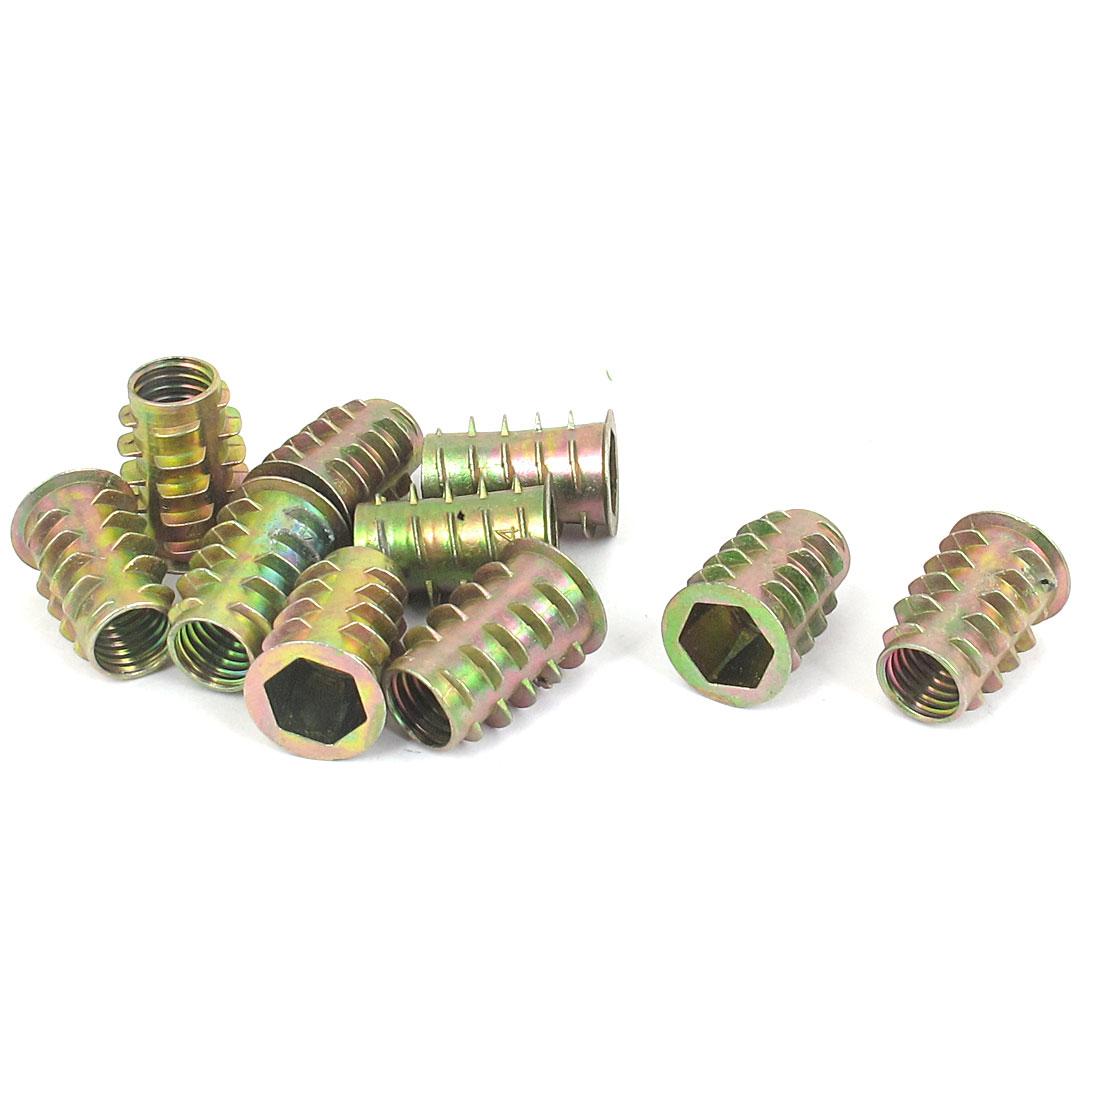 10 Pcs M10x23mm Zinc Plated Hex Socket Screw in Thread Insert Nut for Wood